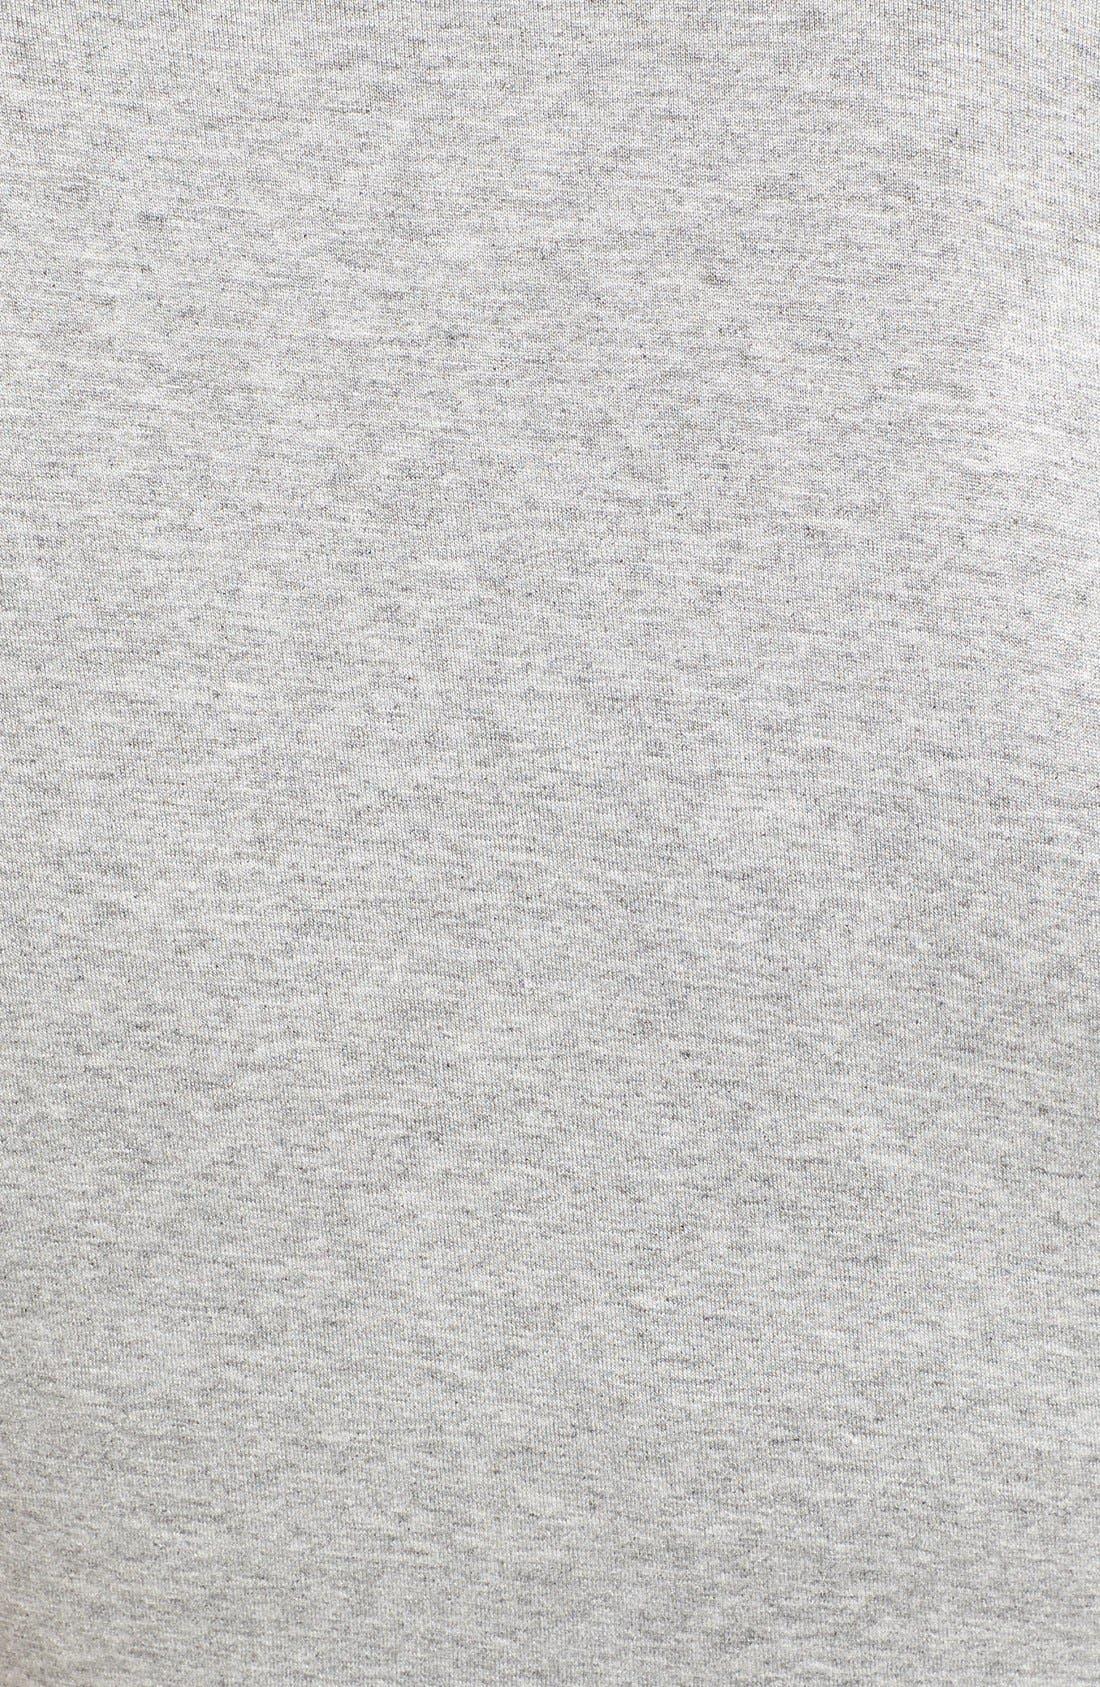 V-Neck Maxi Dress,                             Alternate thumbnail 5, color,                             Light Heather Grey